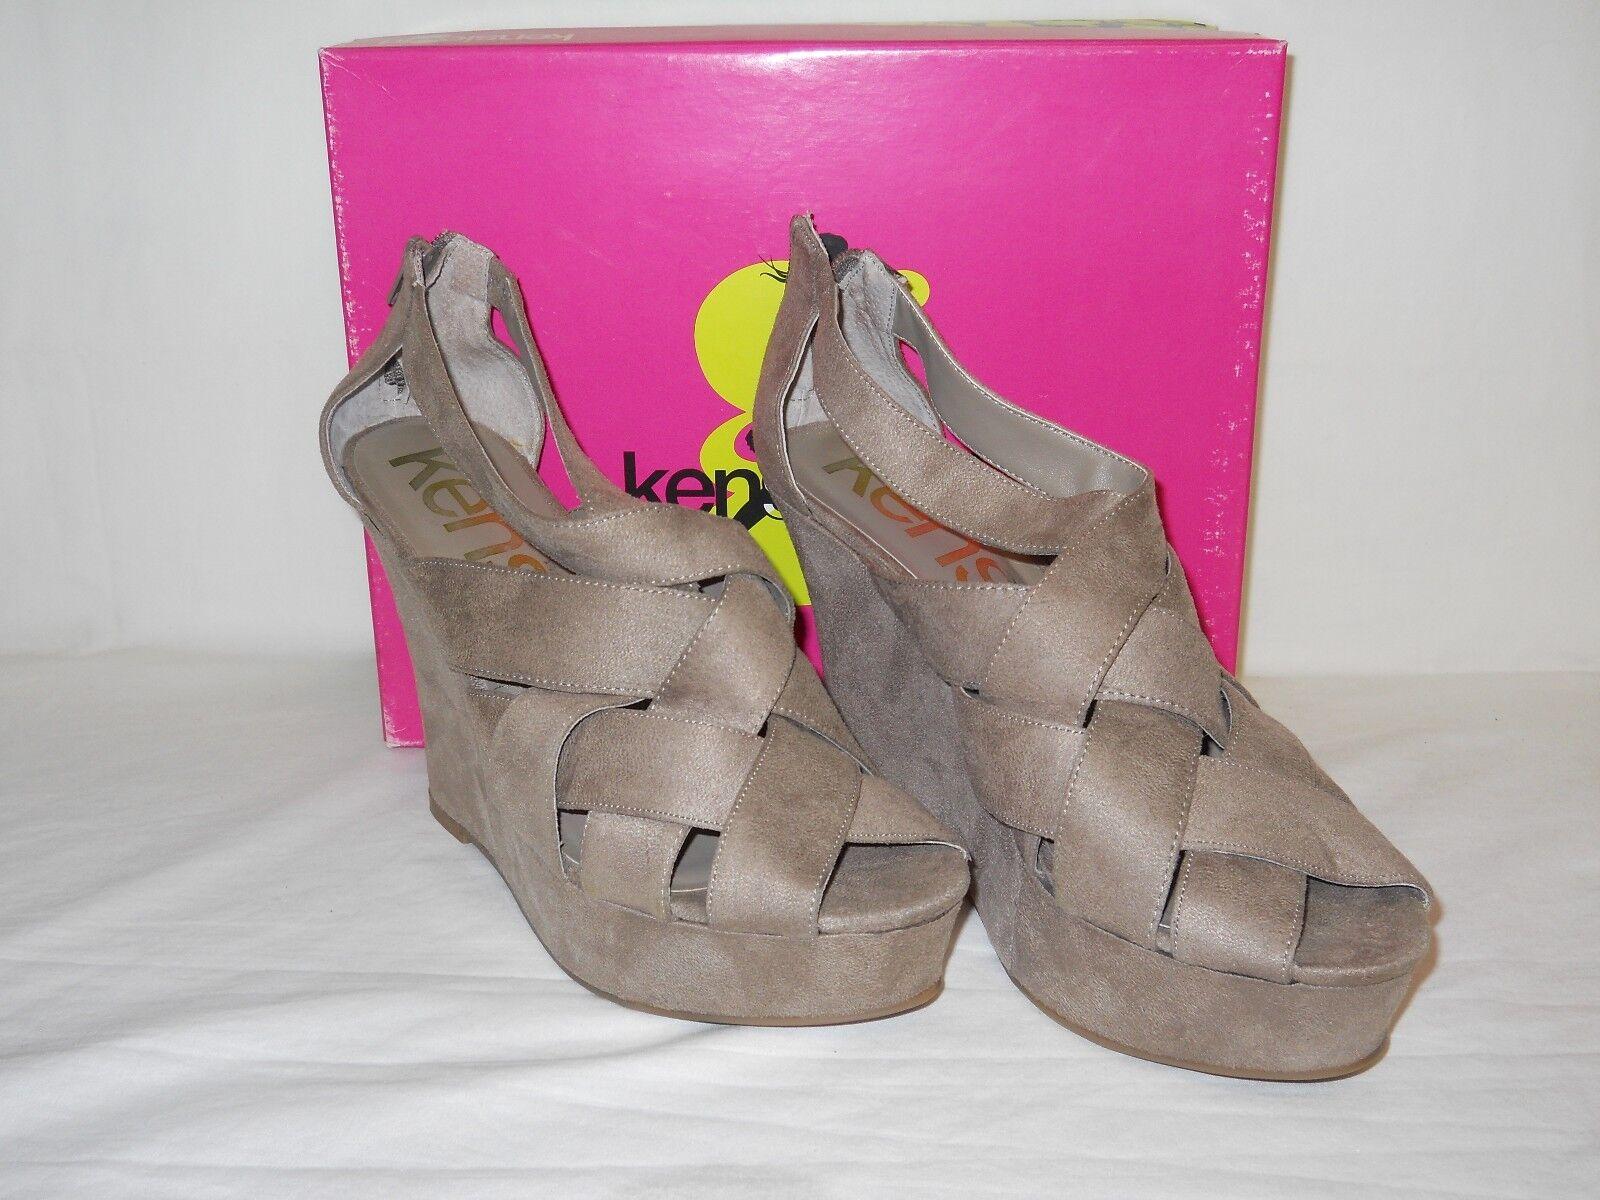 Kensie Girl New Womens Gavin Beige Shoes Wedge Sandals 9 M Shoes Beige NWB d03ed7